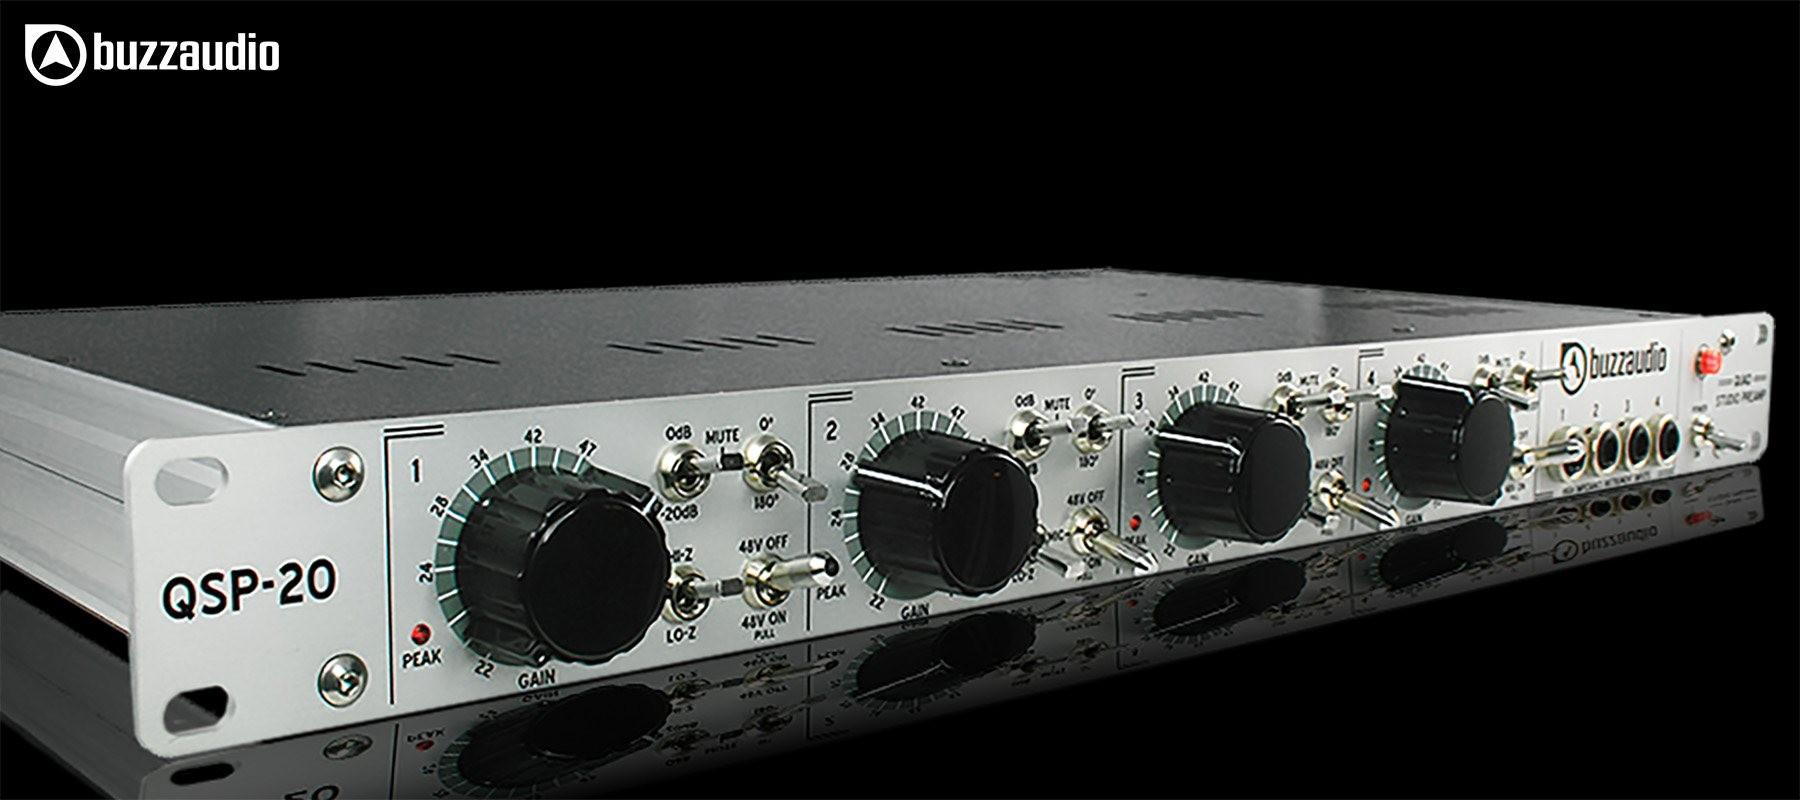 Buzz Audio QSP-20 - Gauche